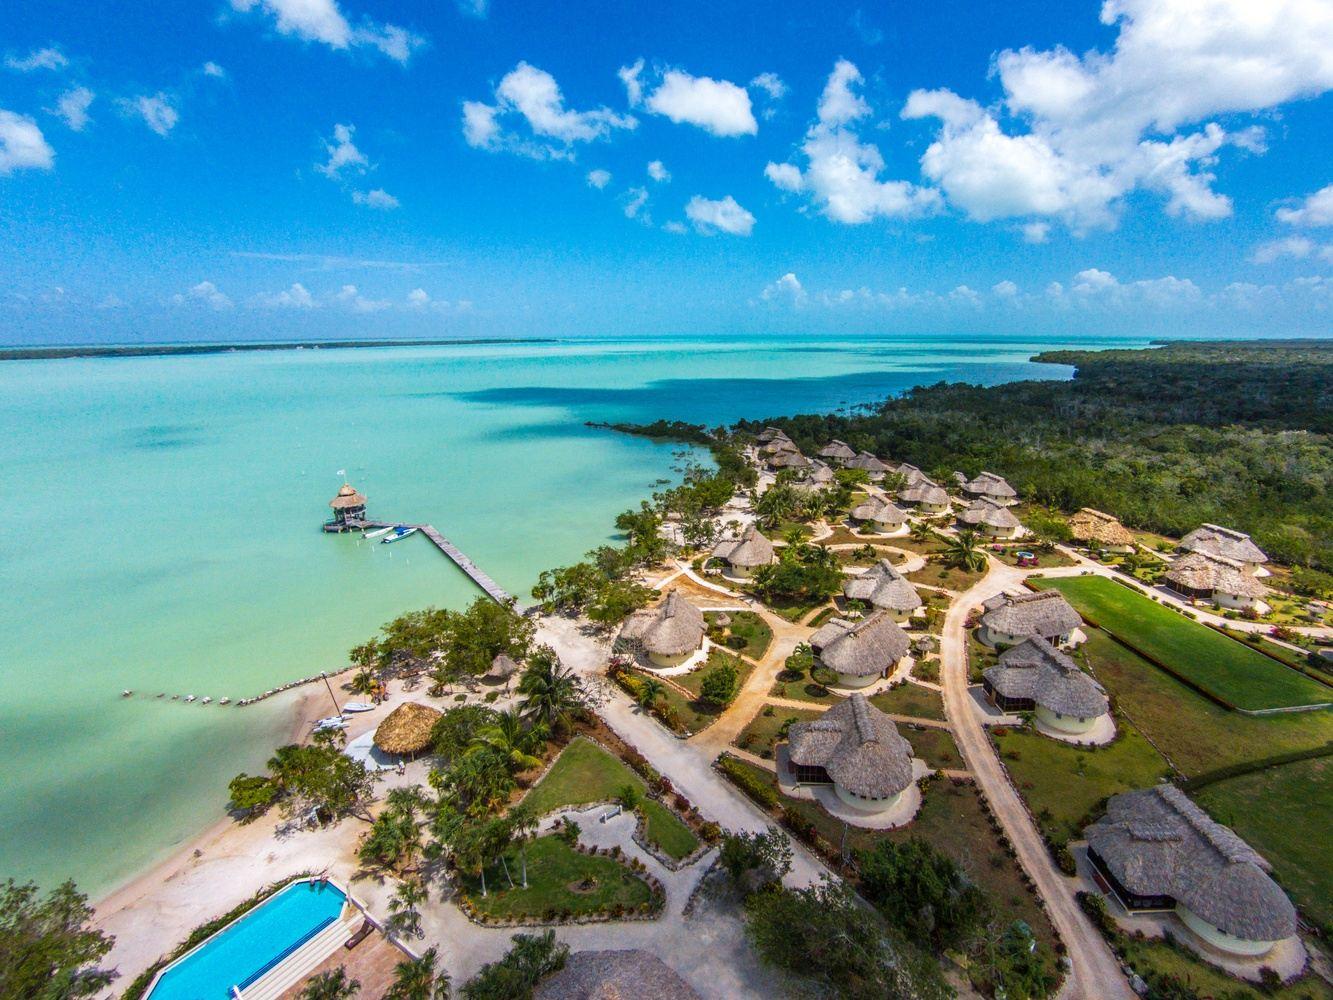 Belize Yoga Adventure Retreat with Jess Trudeau & Callie Feakin